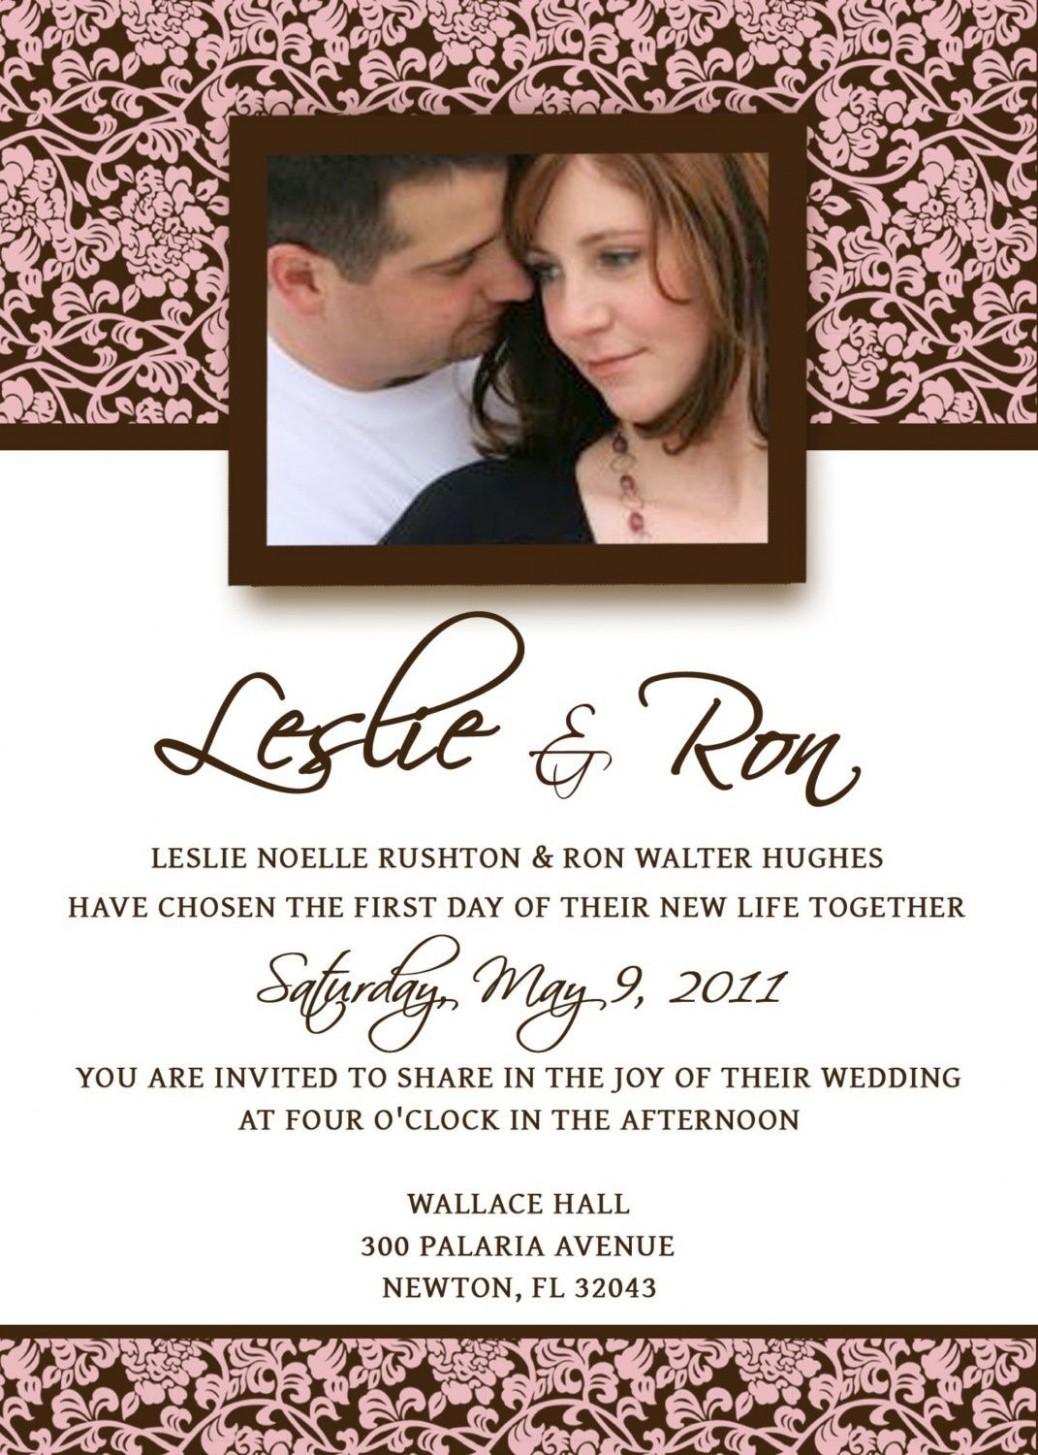 wedding invitation e card template  E Wedding Invitation Cards Free Download E Invitation ..